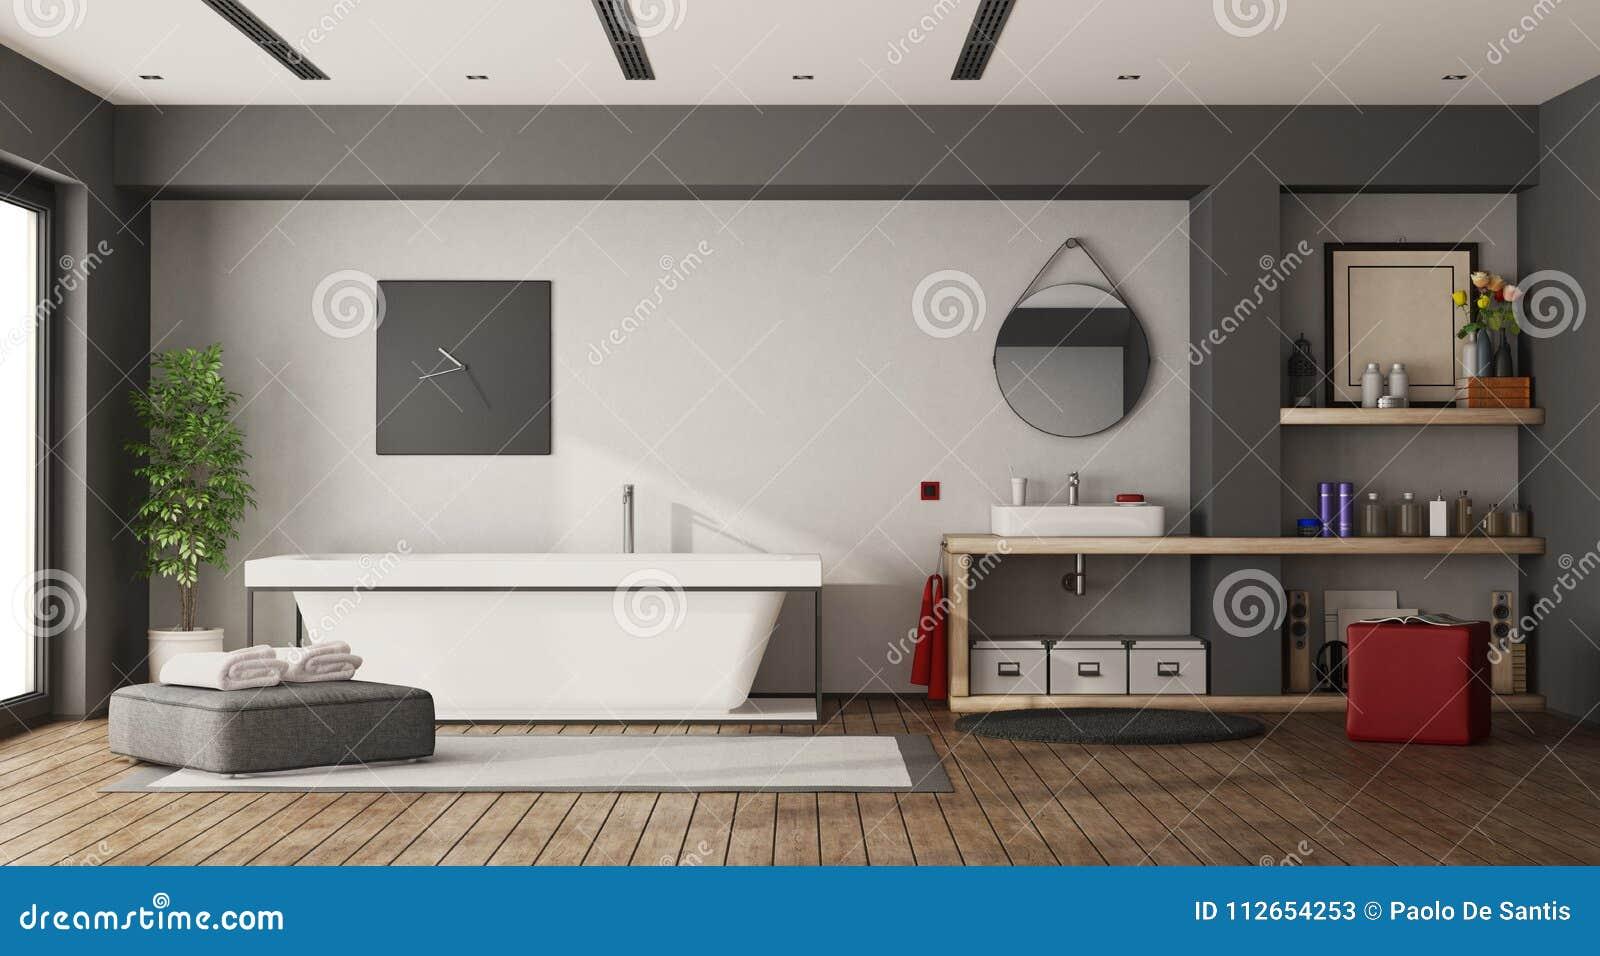 Large Bathroom With Bathtub And Washbasin Stock Illustration ...